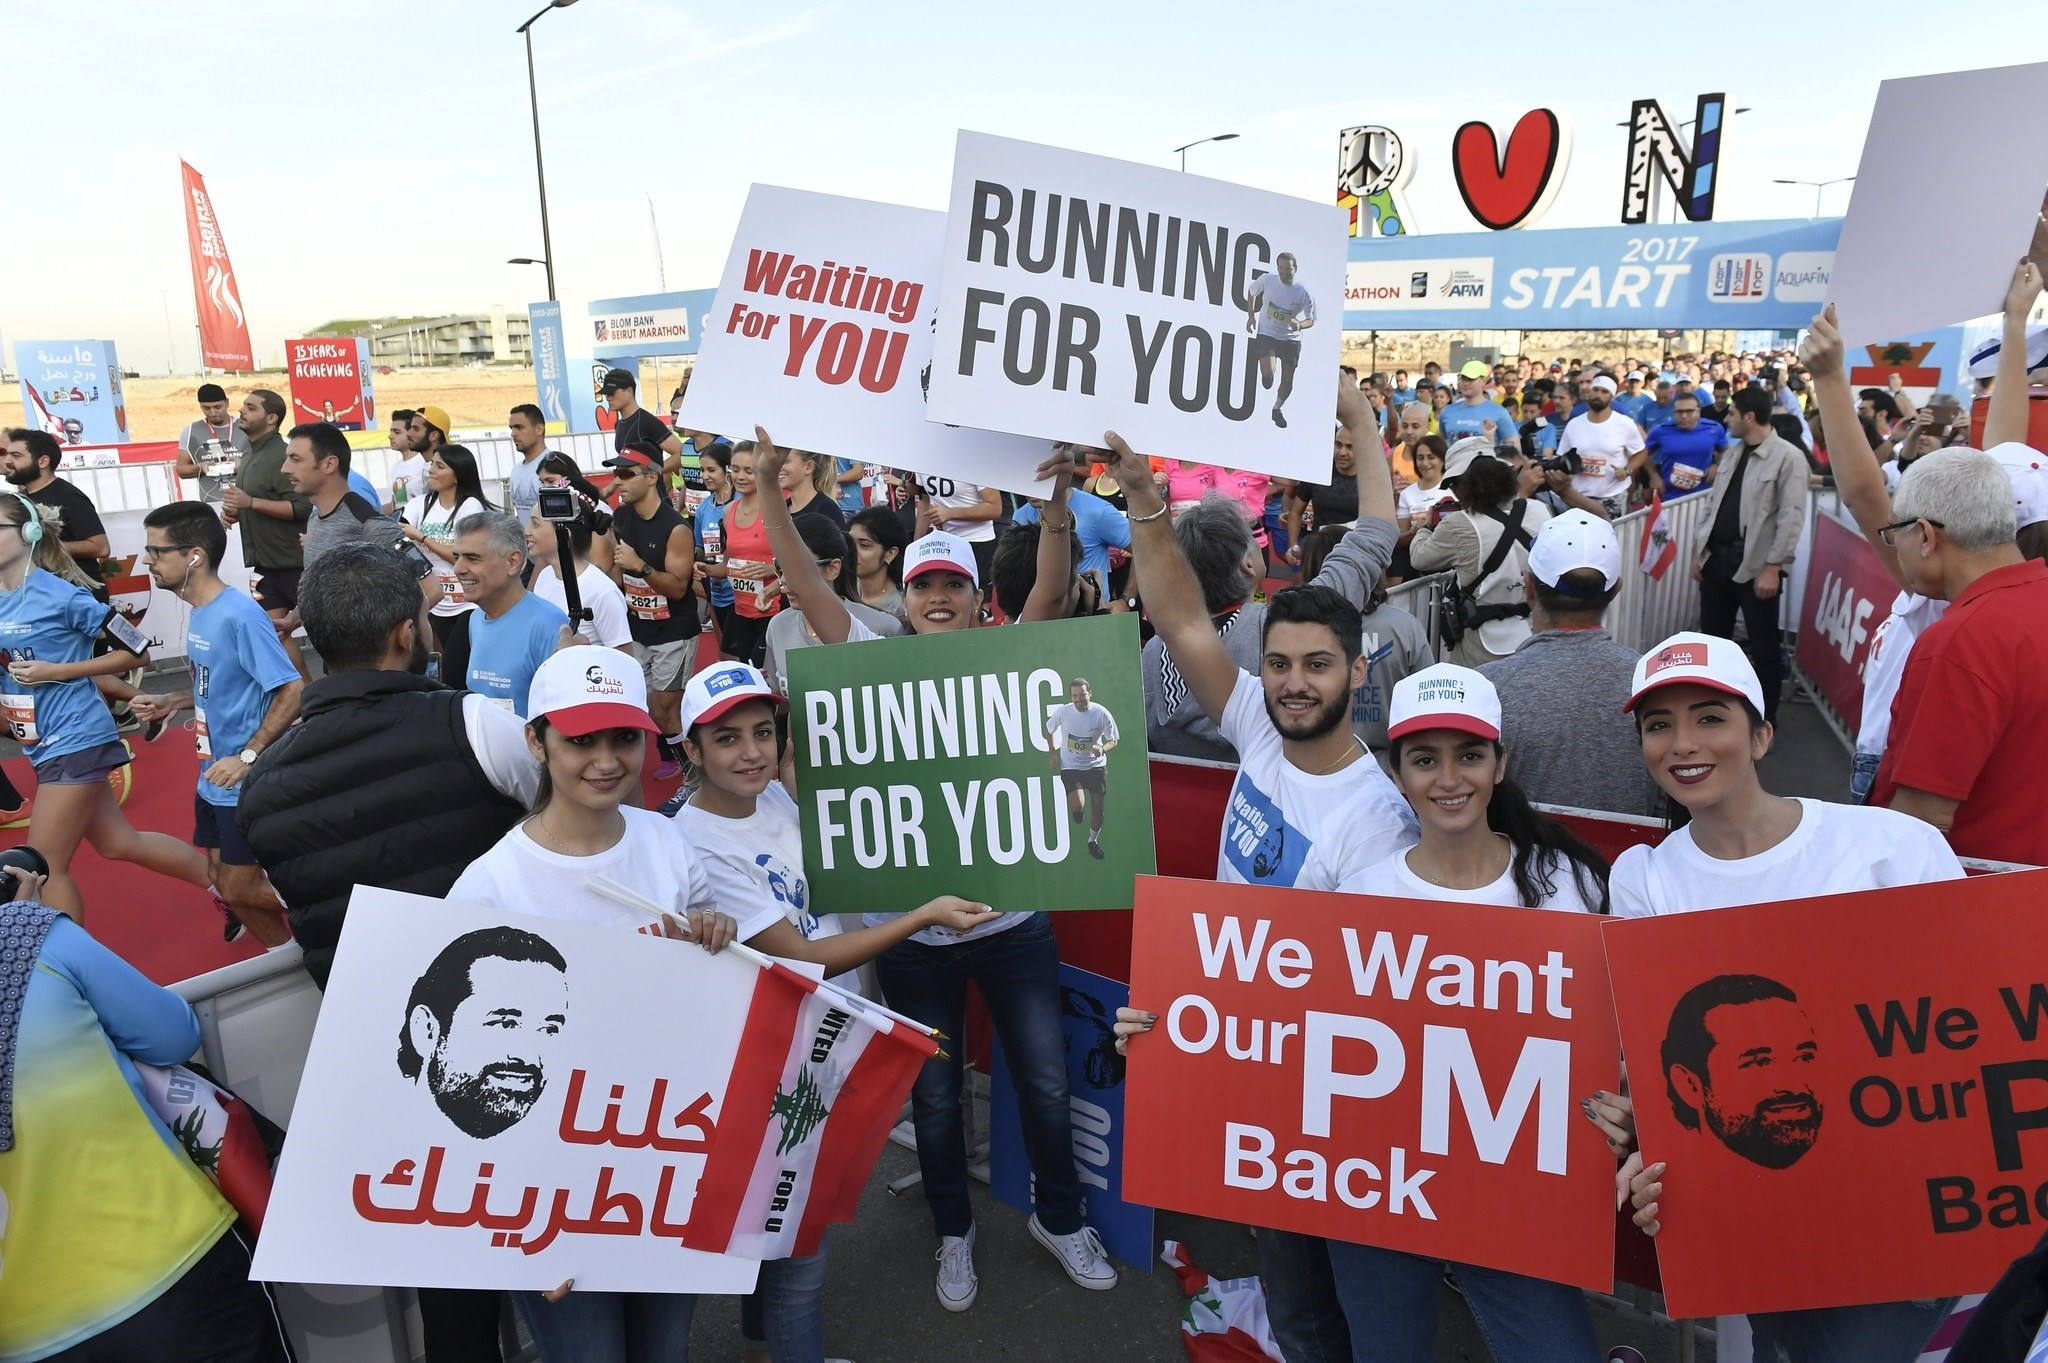 Lebanese youth hold placards demanding the return of Lebanese Prime Minister Saad Hariri from Saudi Arabia during the annual Beirut International Marathon, Beirut, Lebanon, Nov. 12, 2017. (EPA Photo)